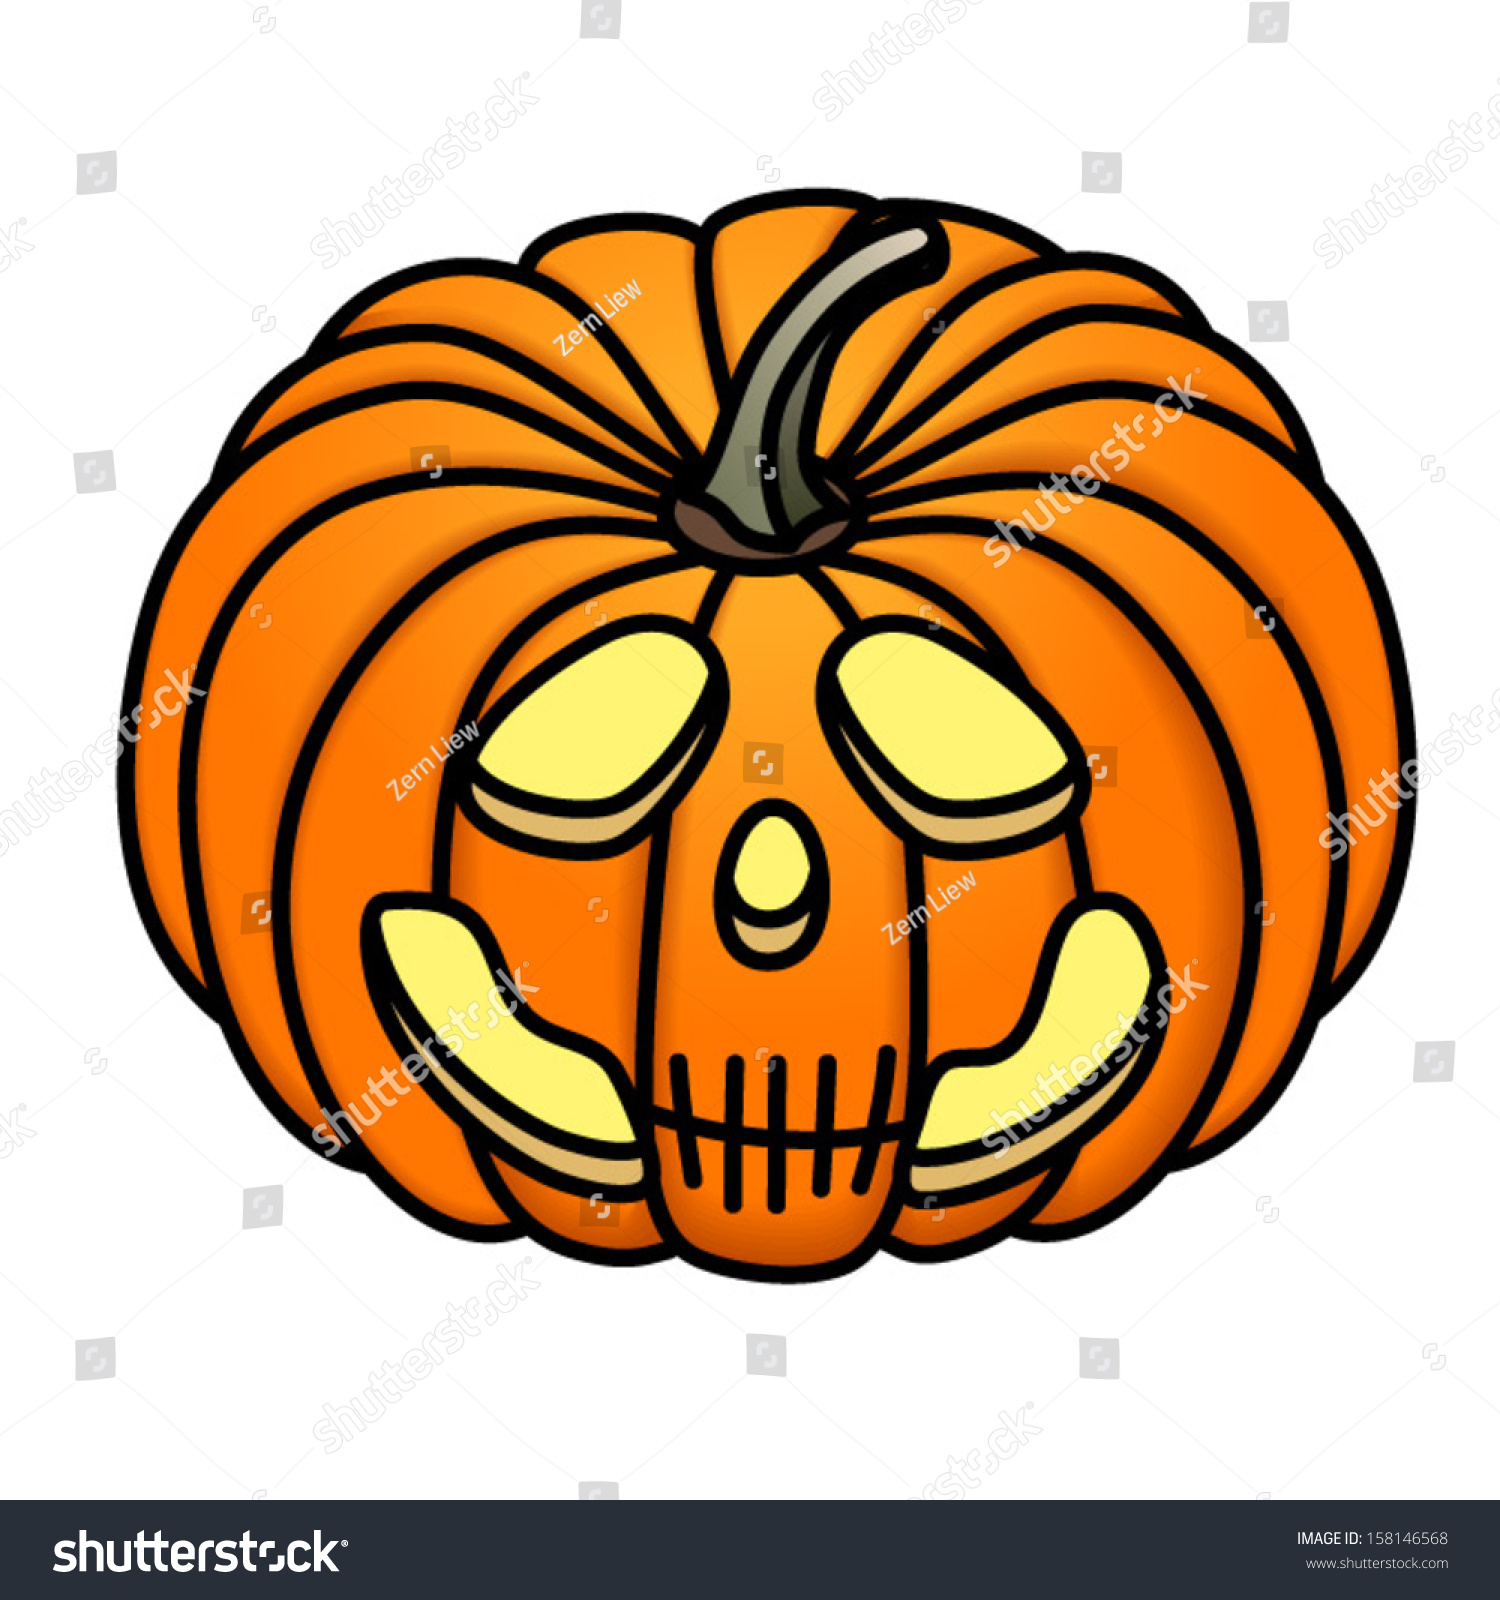 Sad Skull Jackolantern Stock Vector Royalty Free 158146568